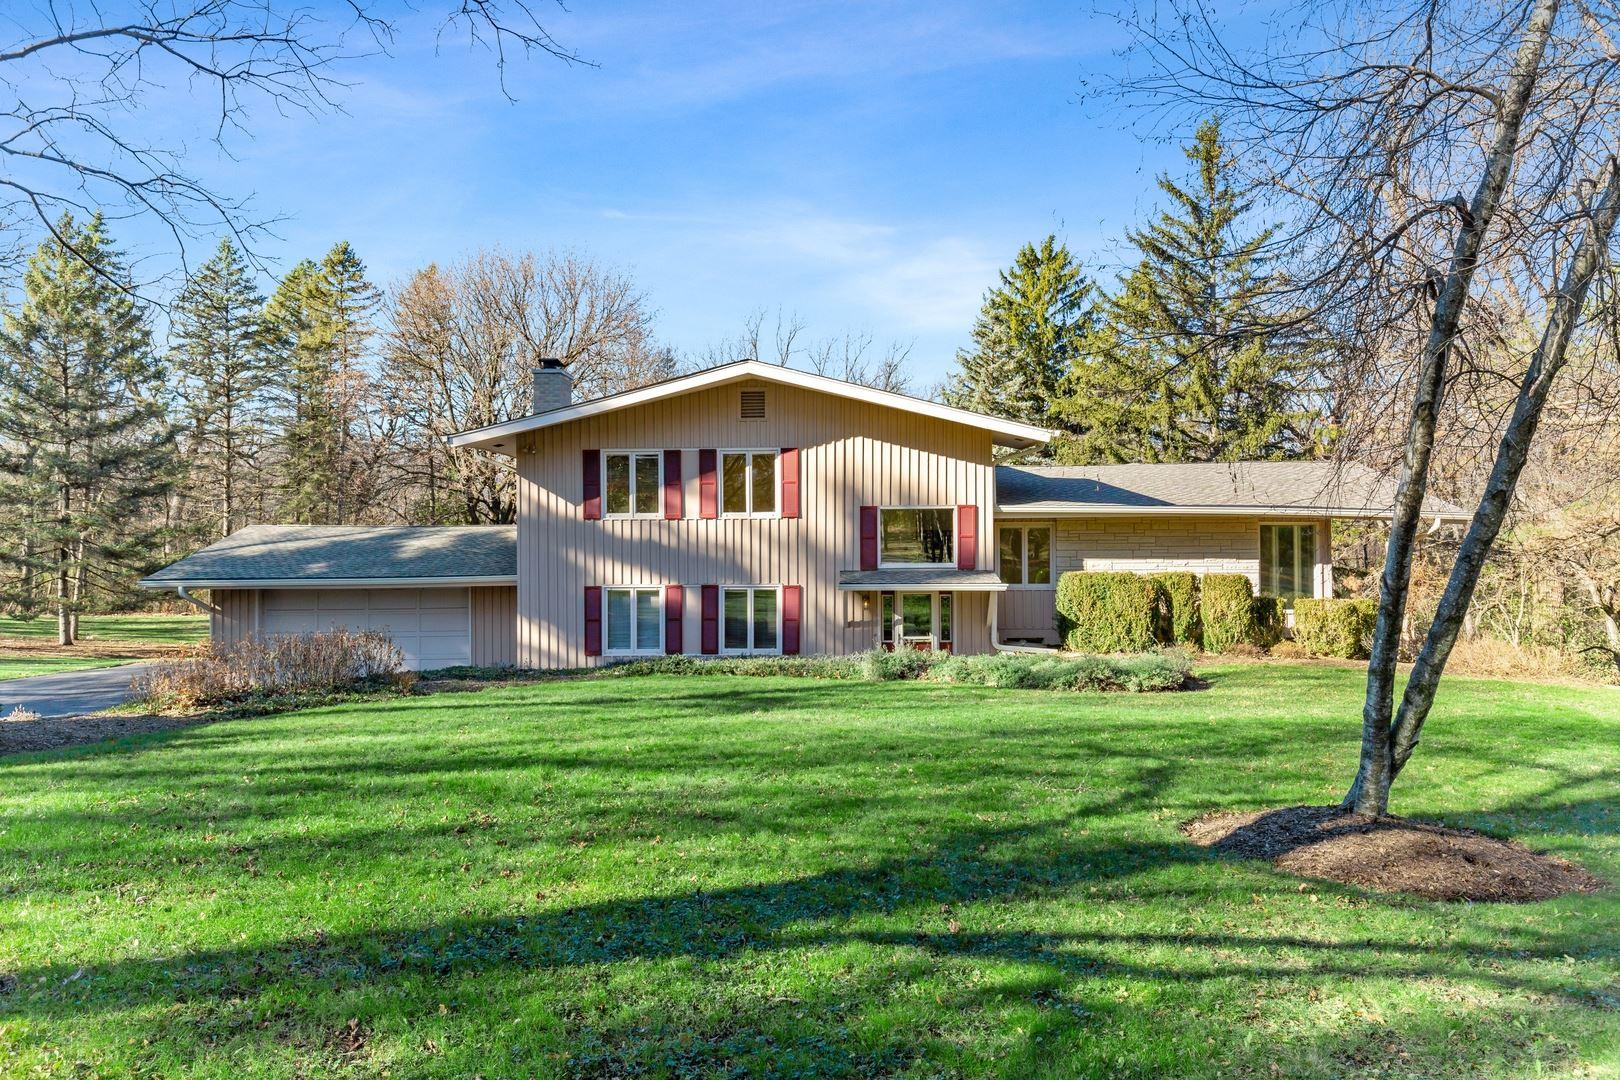 4702 Shady Oaks Lane, Crystal Lake, IL 60012 - #: 10937557